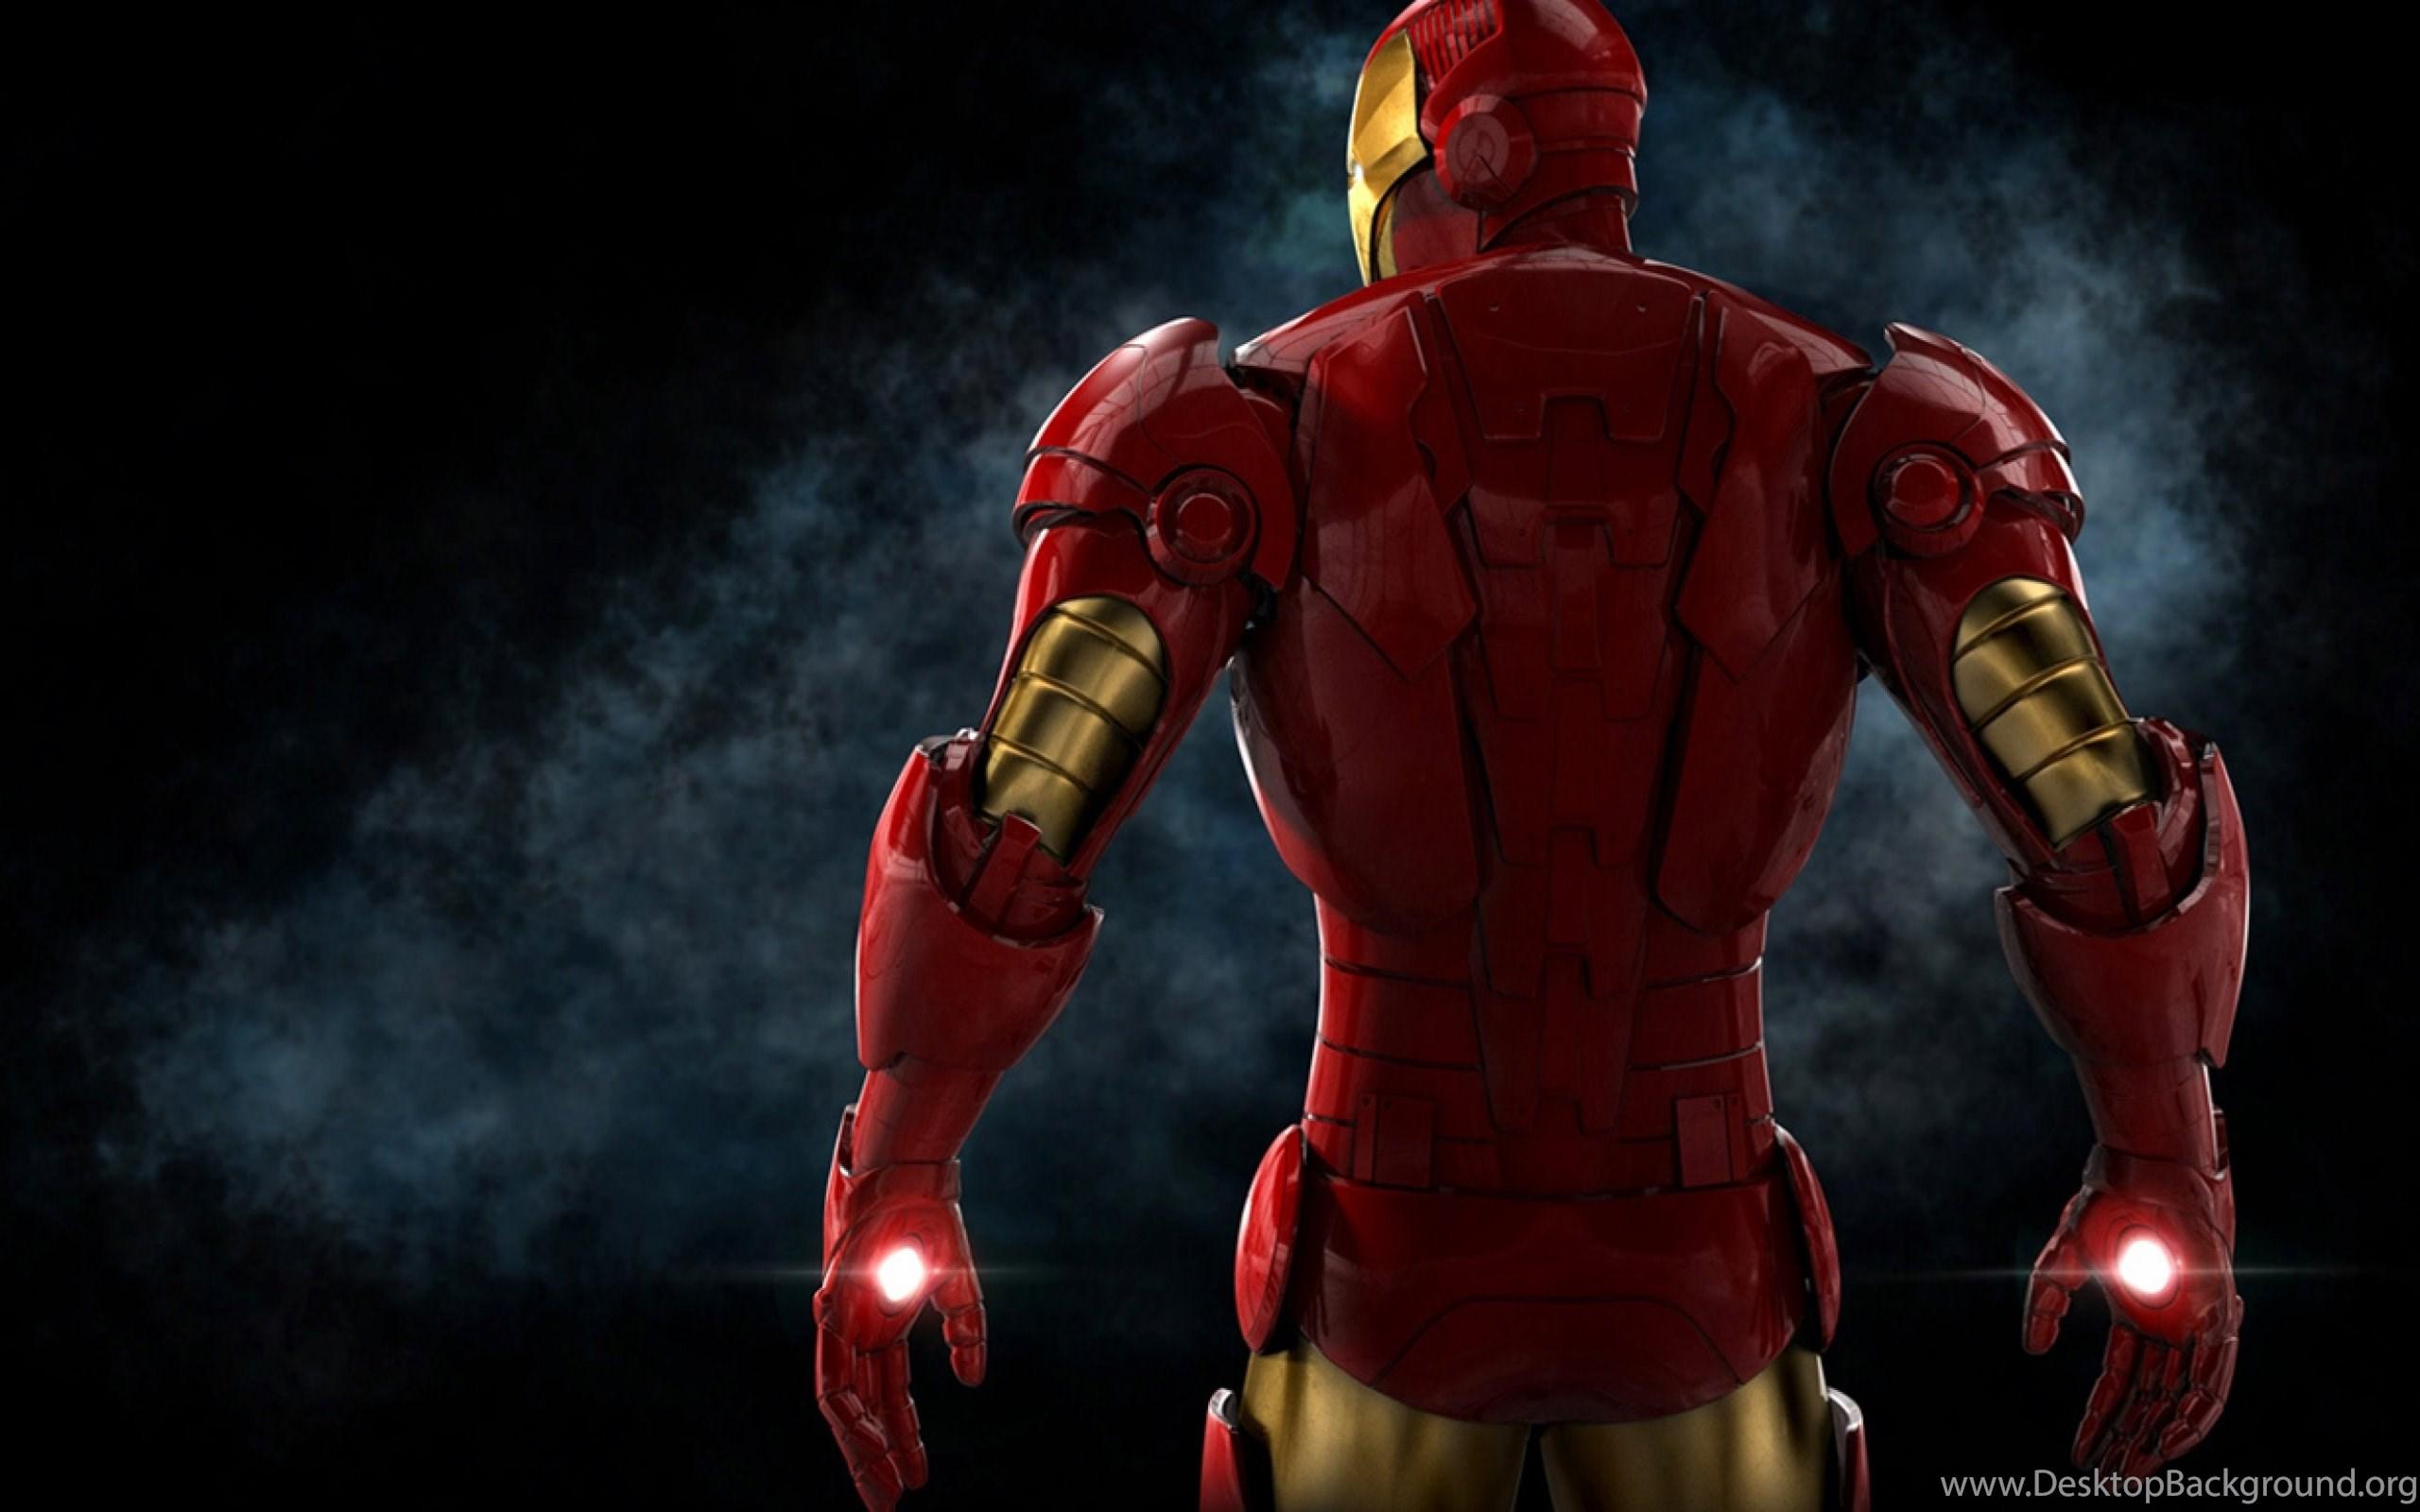 Top Wallpaper High Resolution Iron Man - 700384_wallpapers-iron-man-high-resolution-backside-x-widescreen-mac-hd_2560x1600_h  2018_337935.jpg